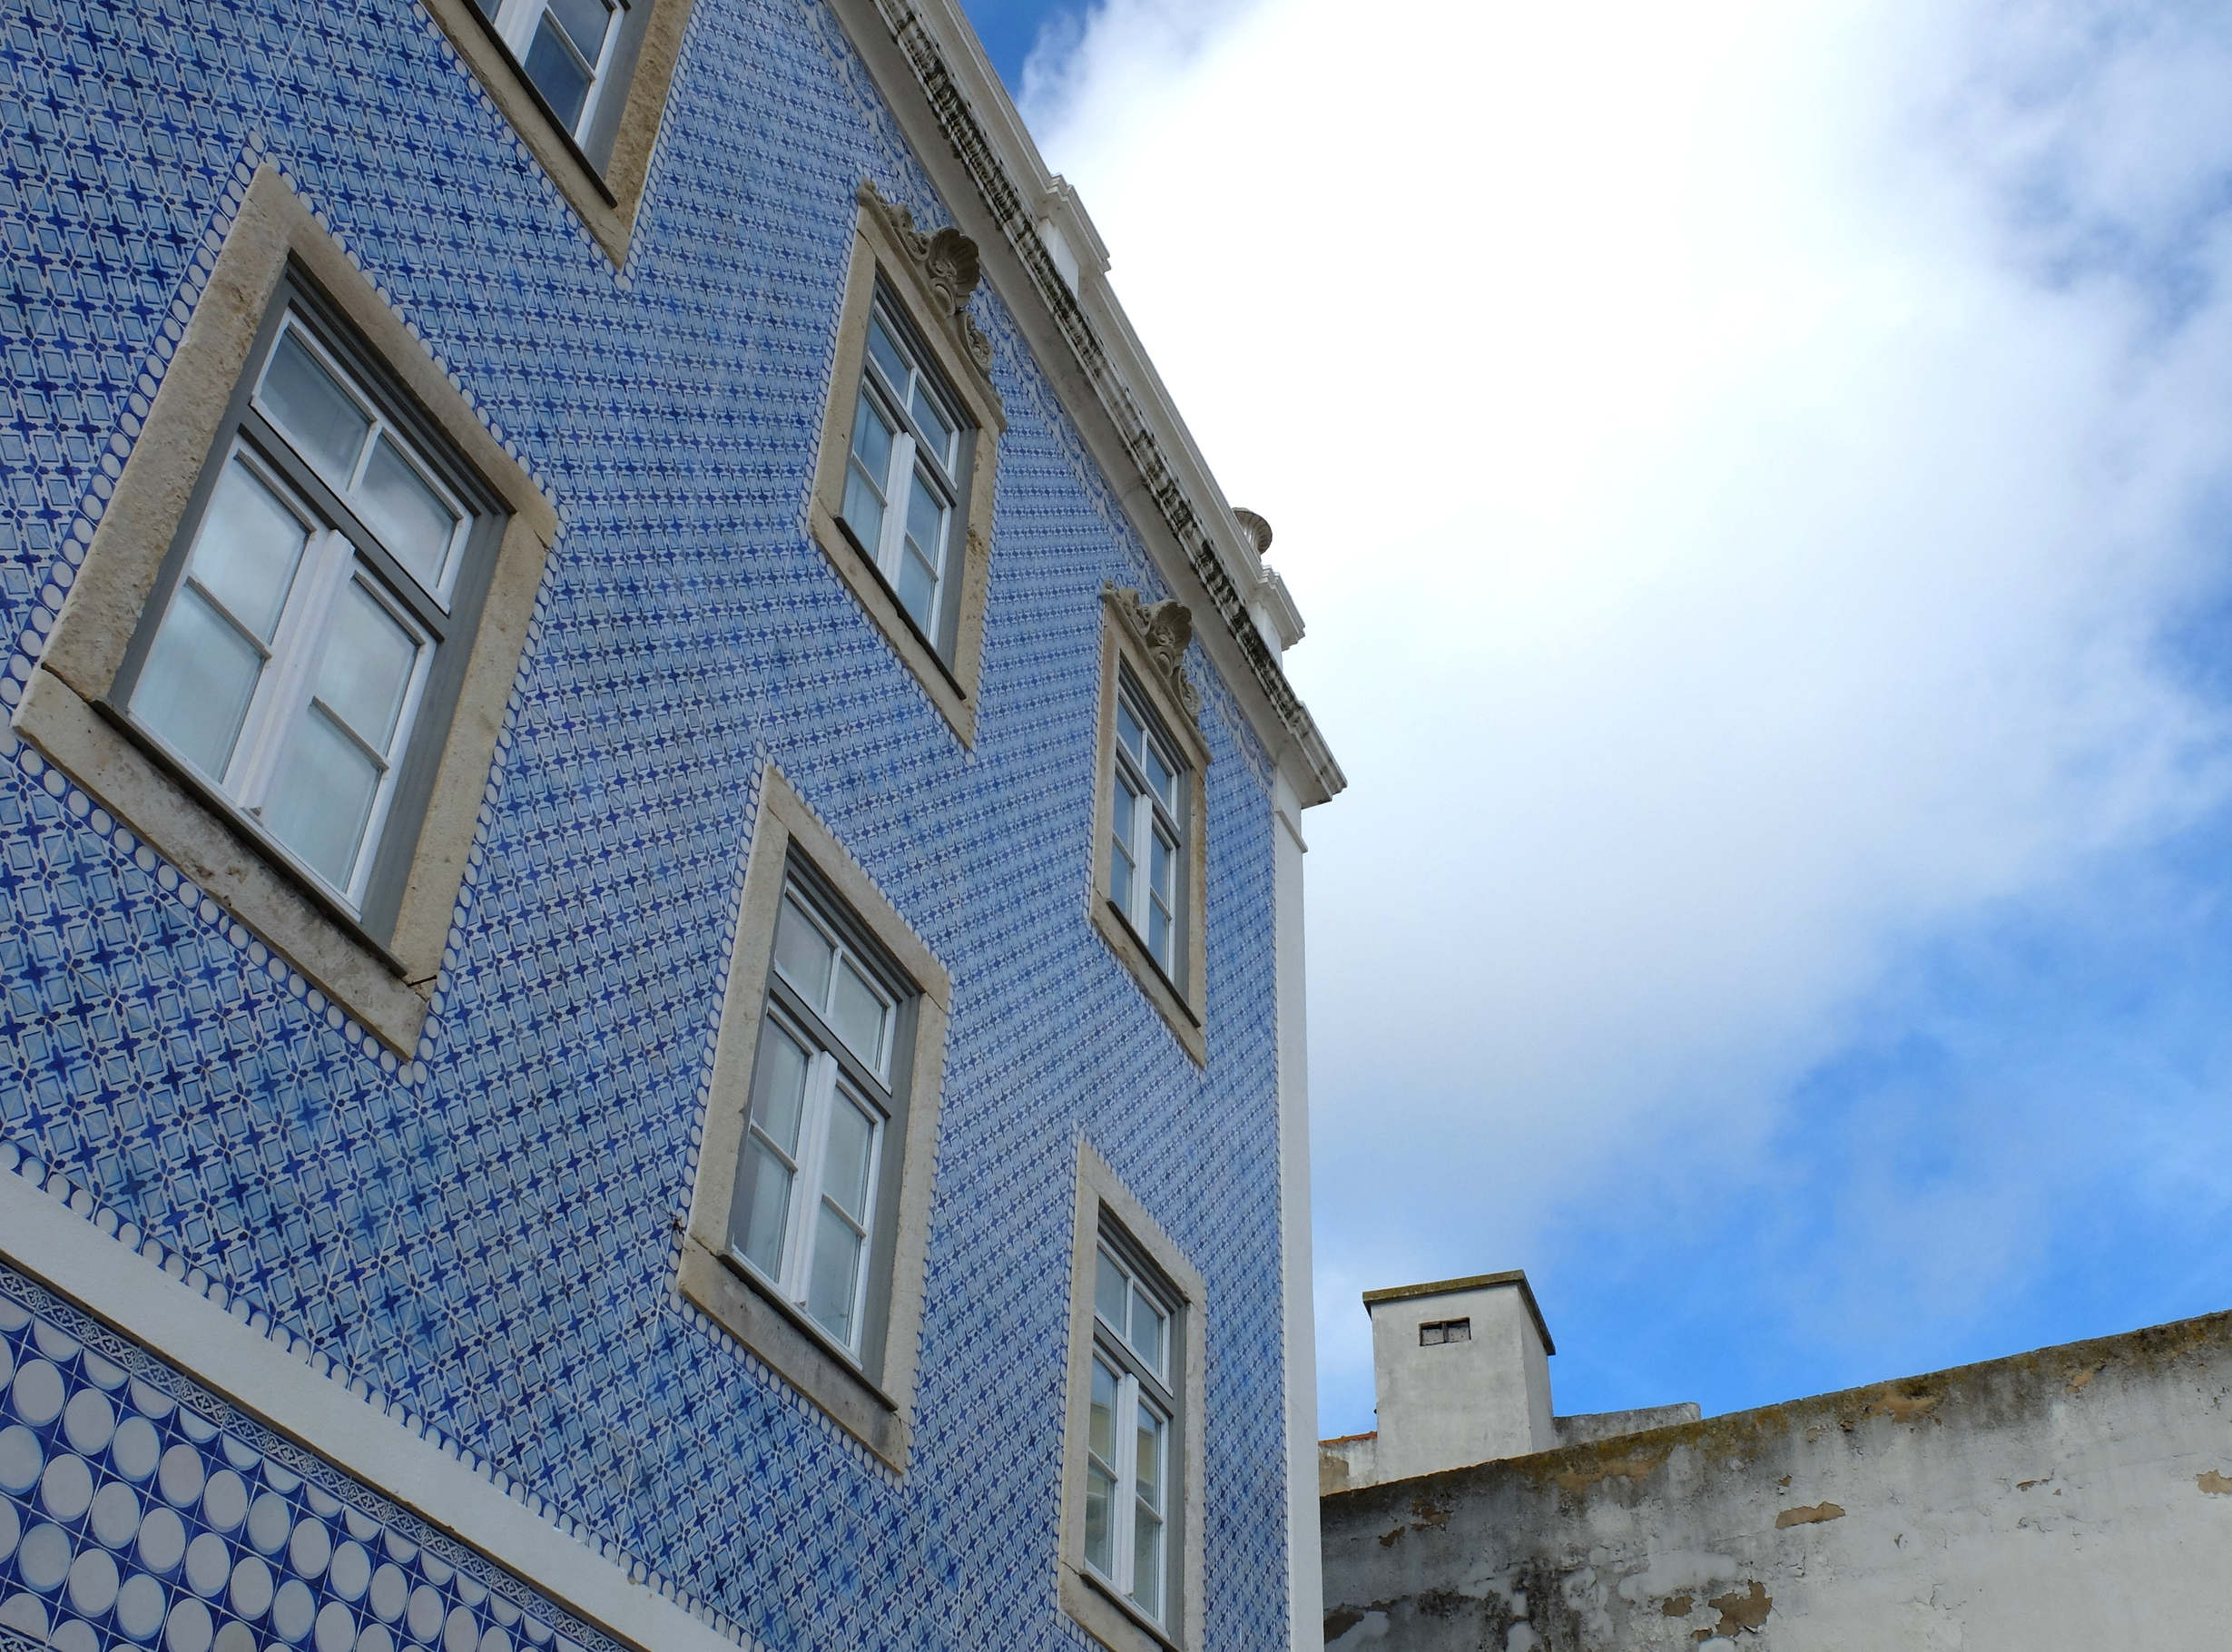 Lisbon tiles blue Lisbon hello getaway cityguide